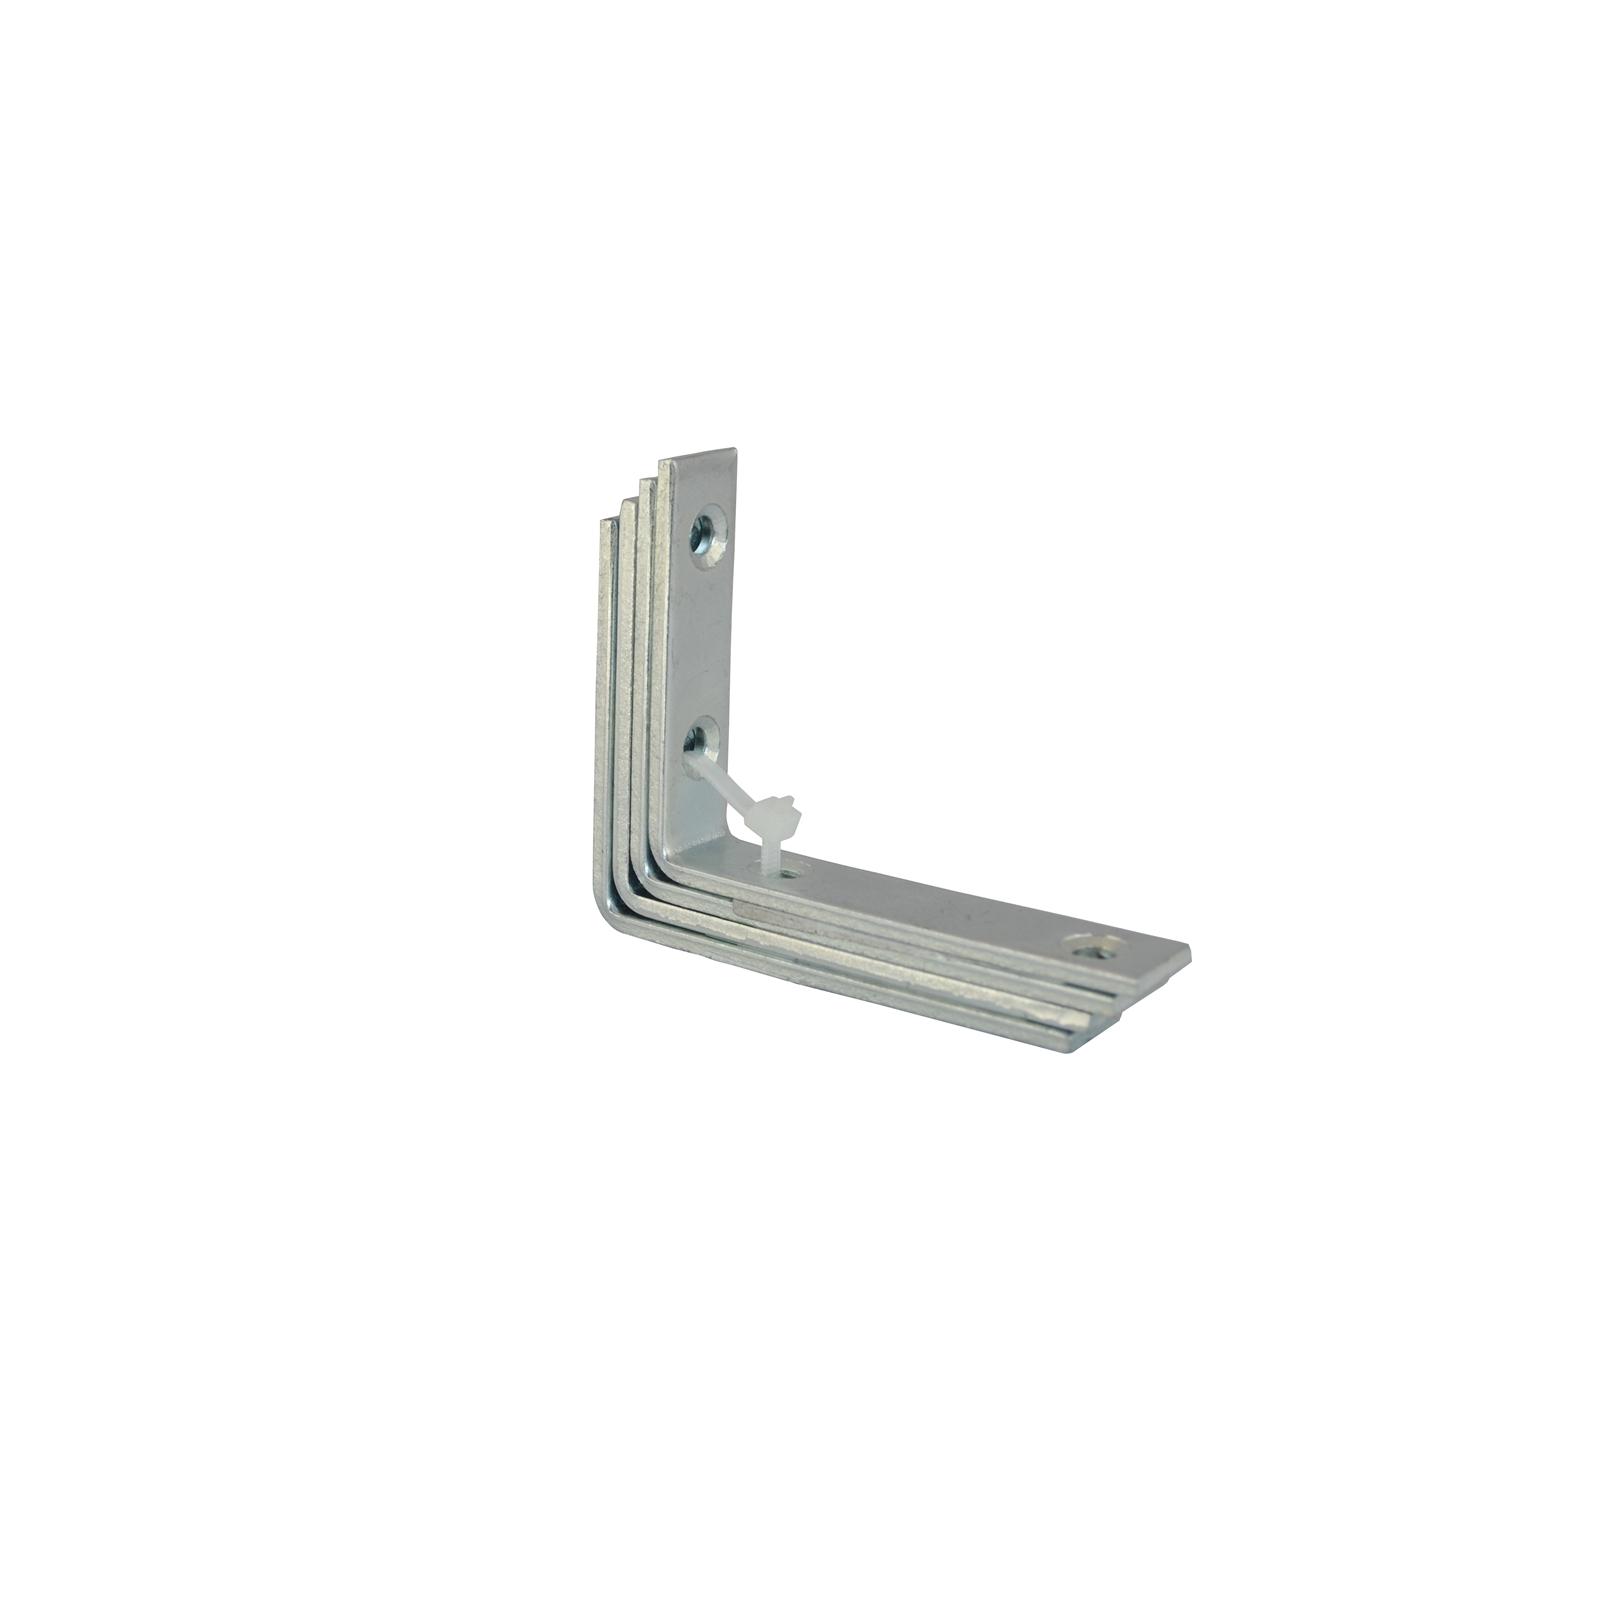 Carinya 100 x 75 x 20 x 4mm Zinc Plated Angle Bracket - 4 Pack